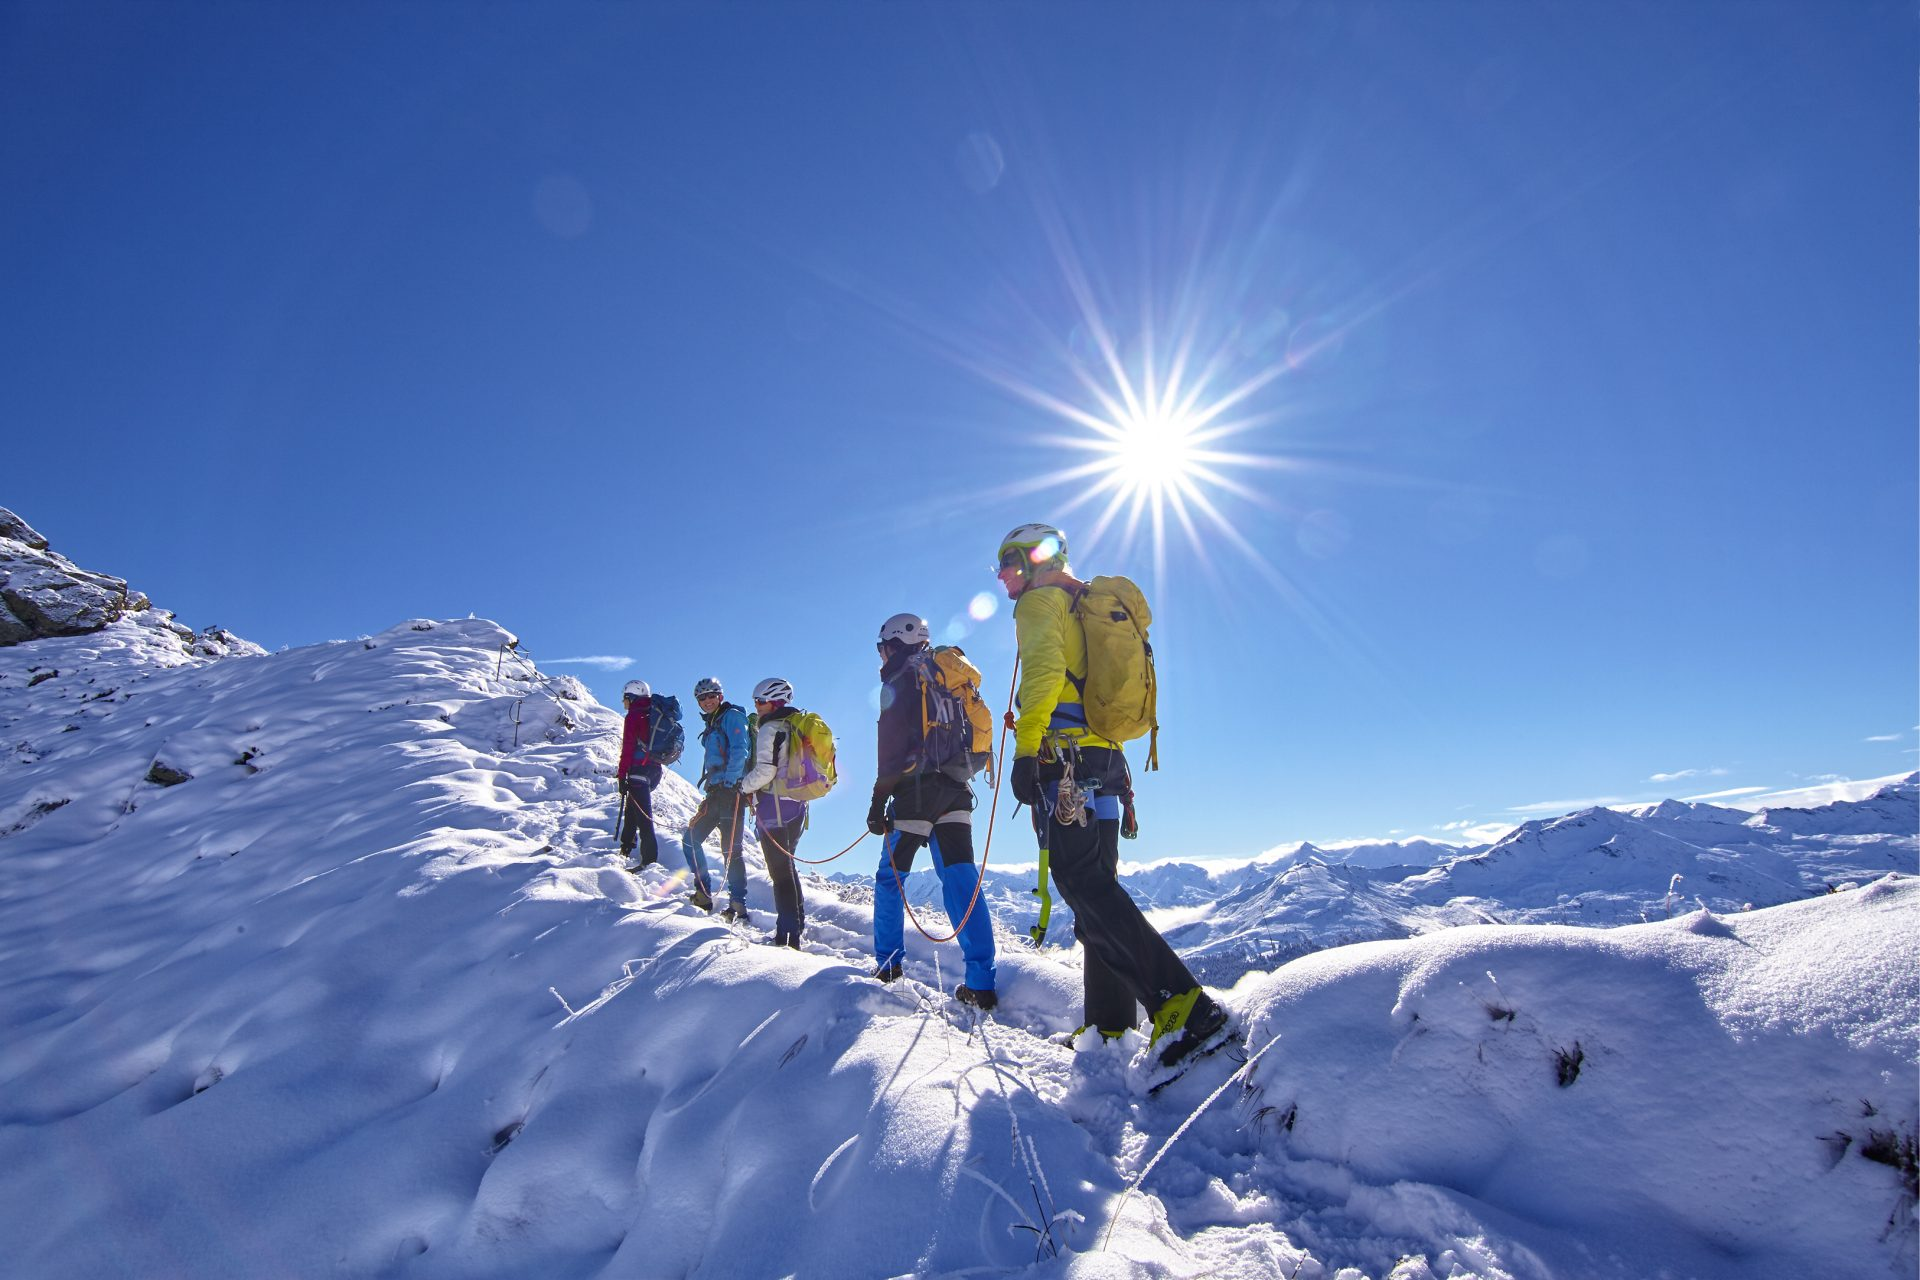 Fünf Kletterer besteigen einen schneebedeckten Gipfel. Fotograf: Jörg Saibou, Köln.